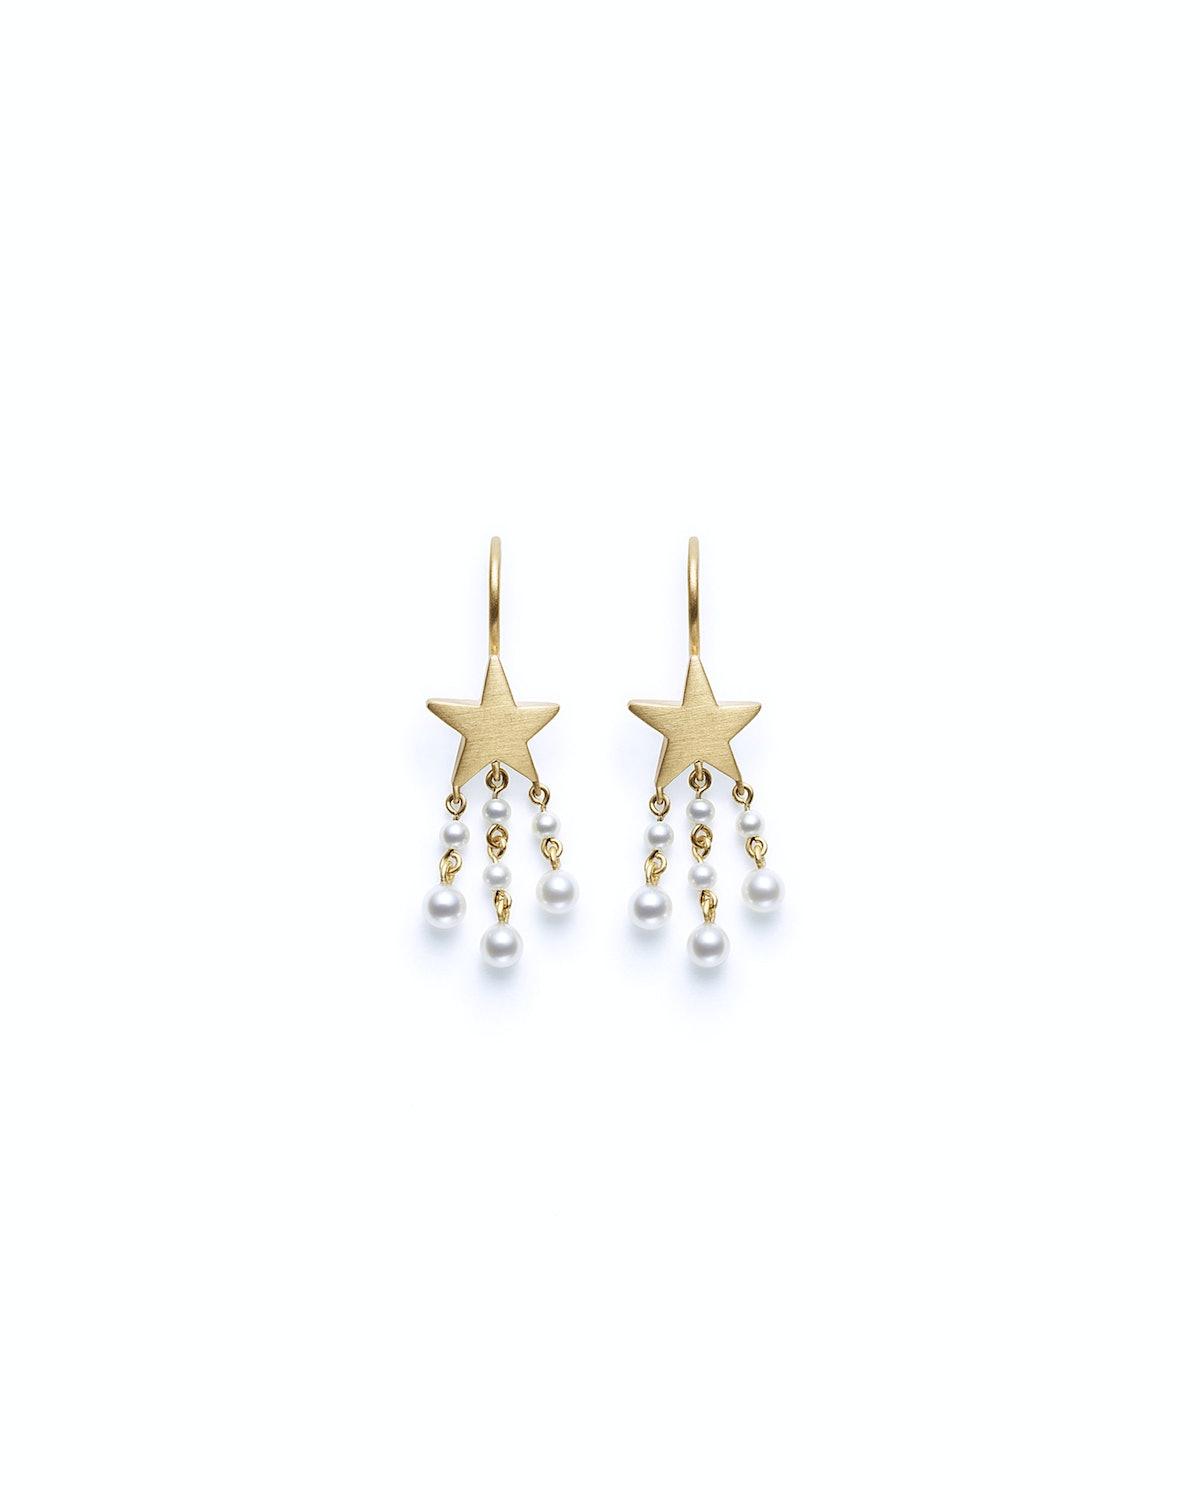 acss-marie-helene-de-talliac-pearls-03